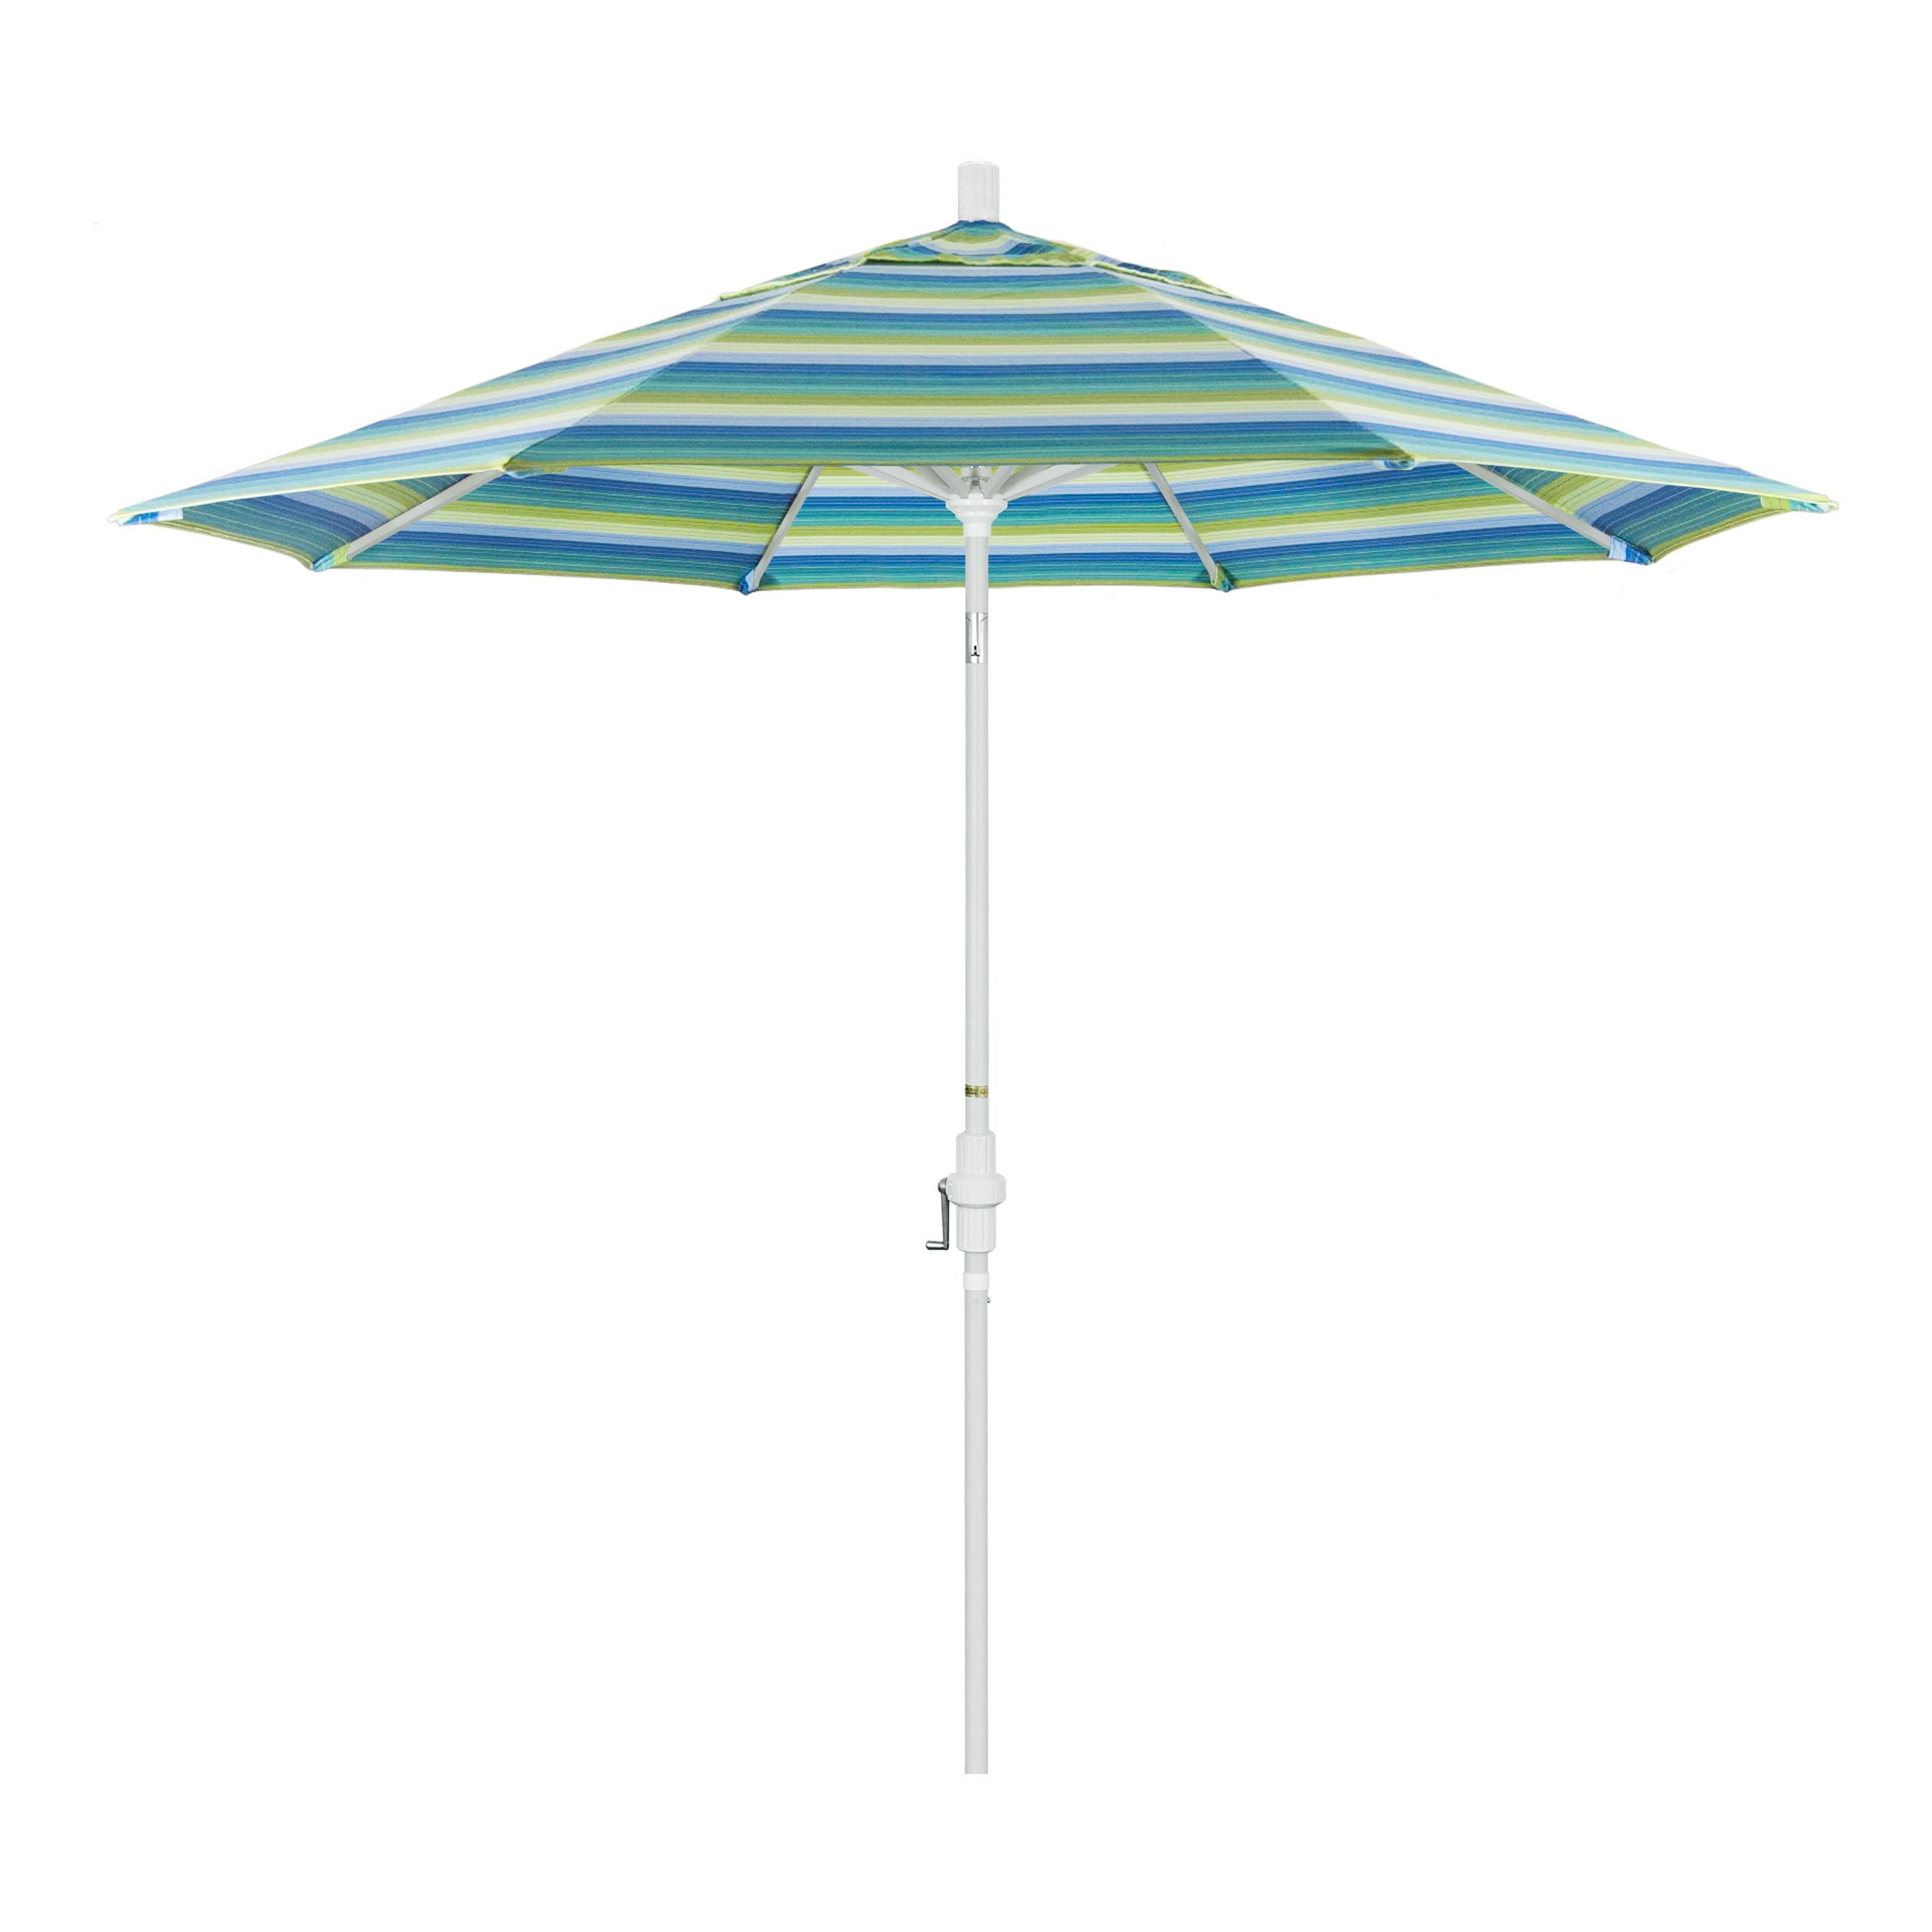 Golden State Series 9' Market Sunbrella Umbrella With Regard To Well Known Carina Market Umbrellas (View 9 of 20)